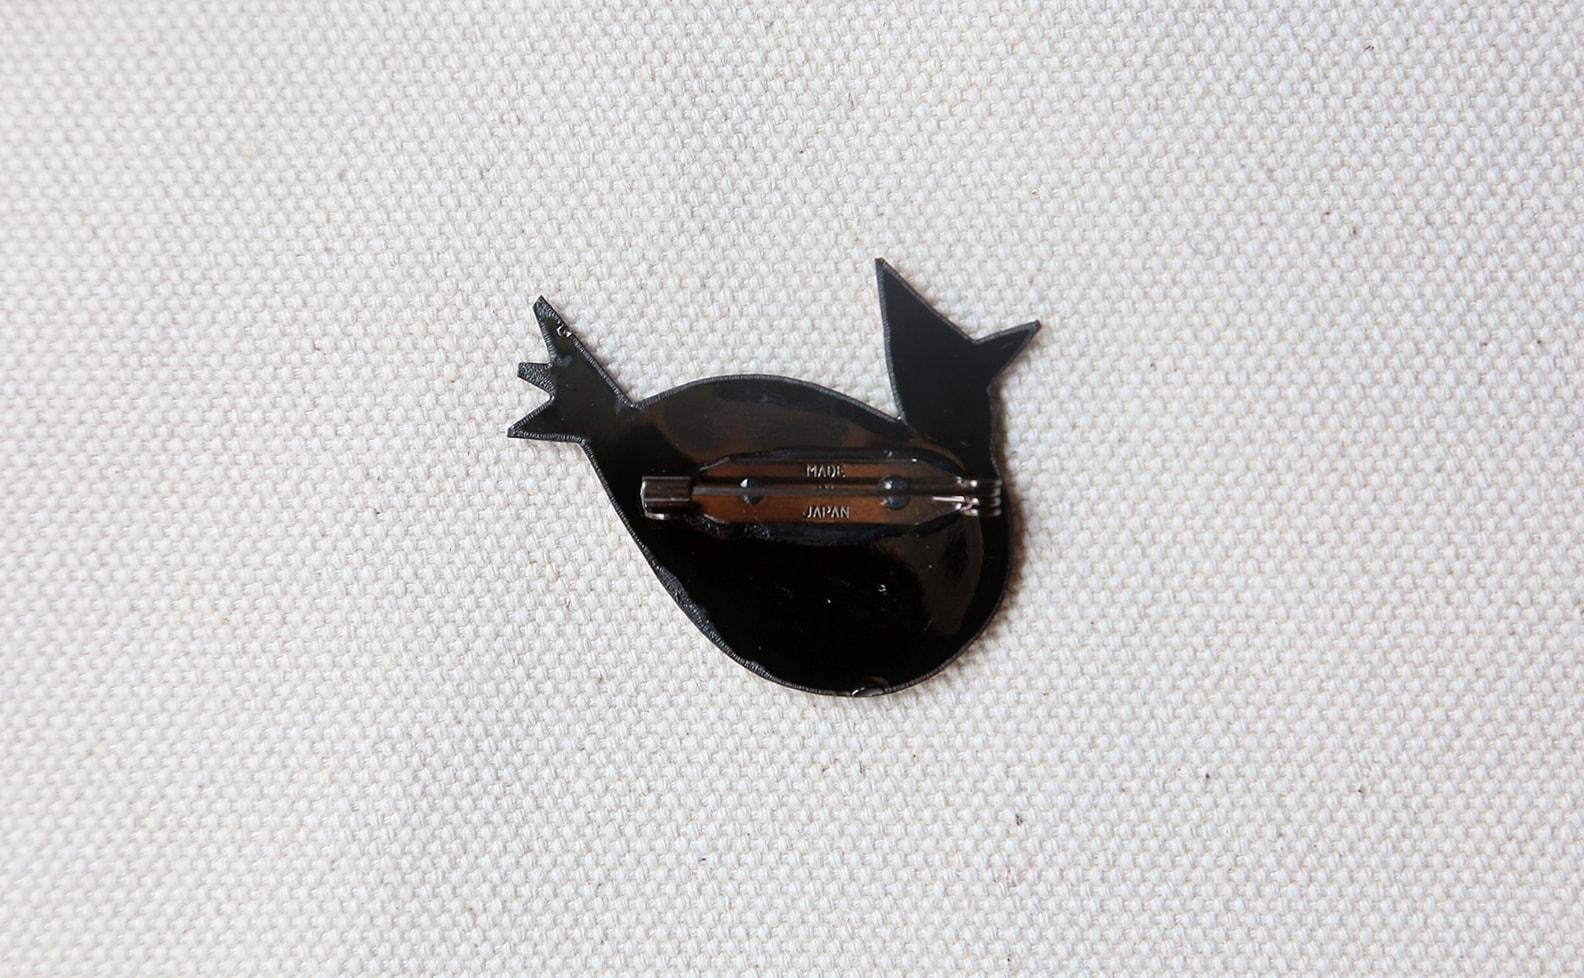 MEDO × ハトホタテ エナメル(七宝焼)ブローチ ニット着たトリ